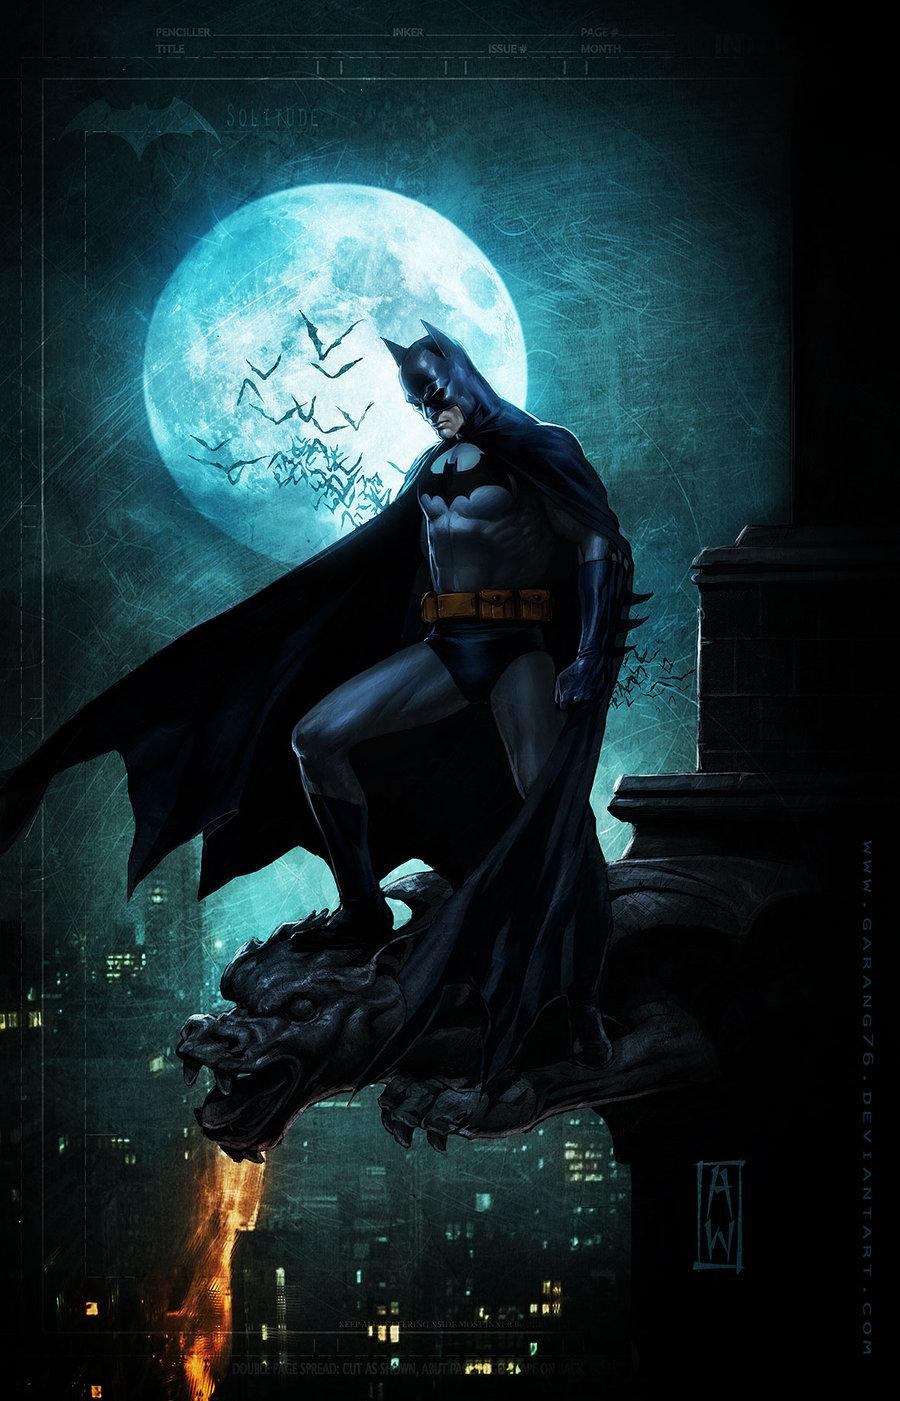 Free Download Batman Vs Superman Female Casting Leads To